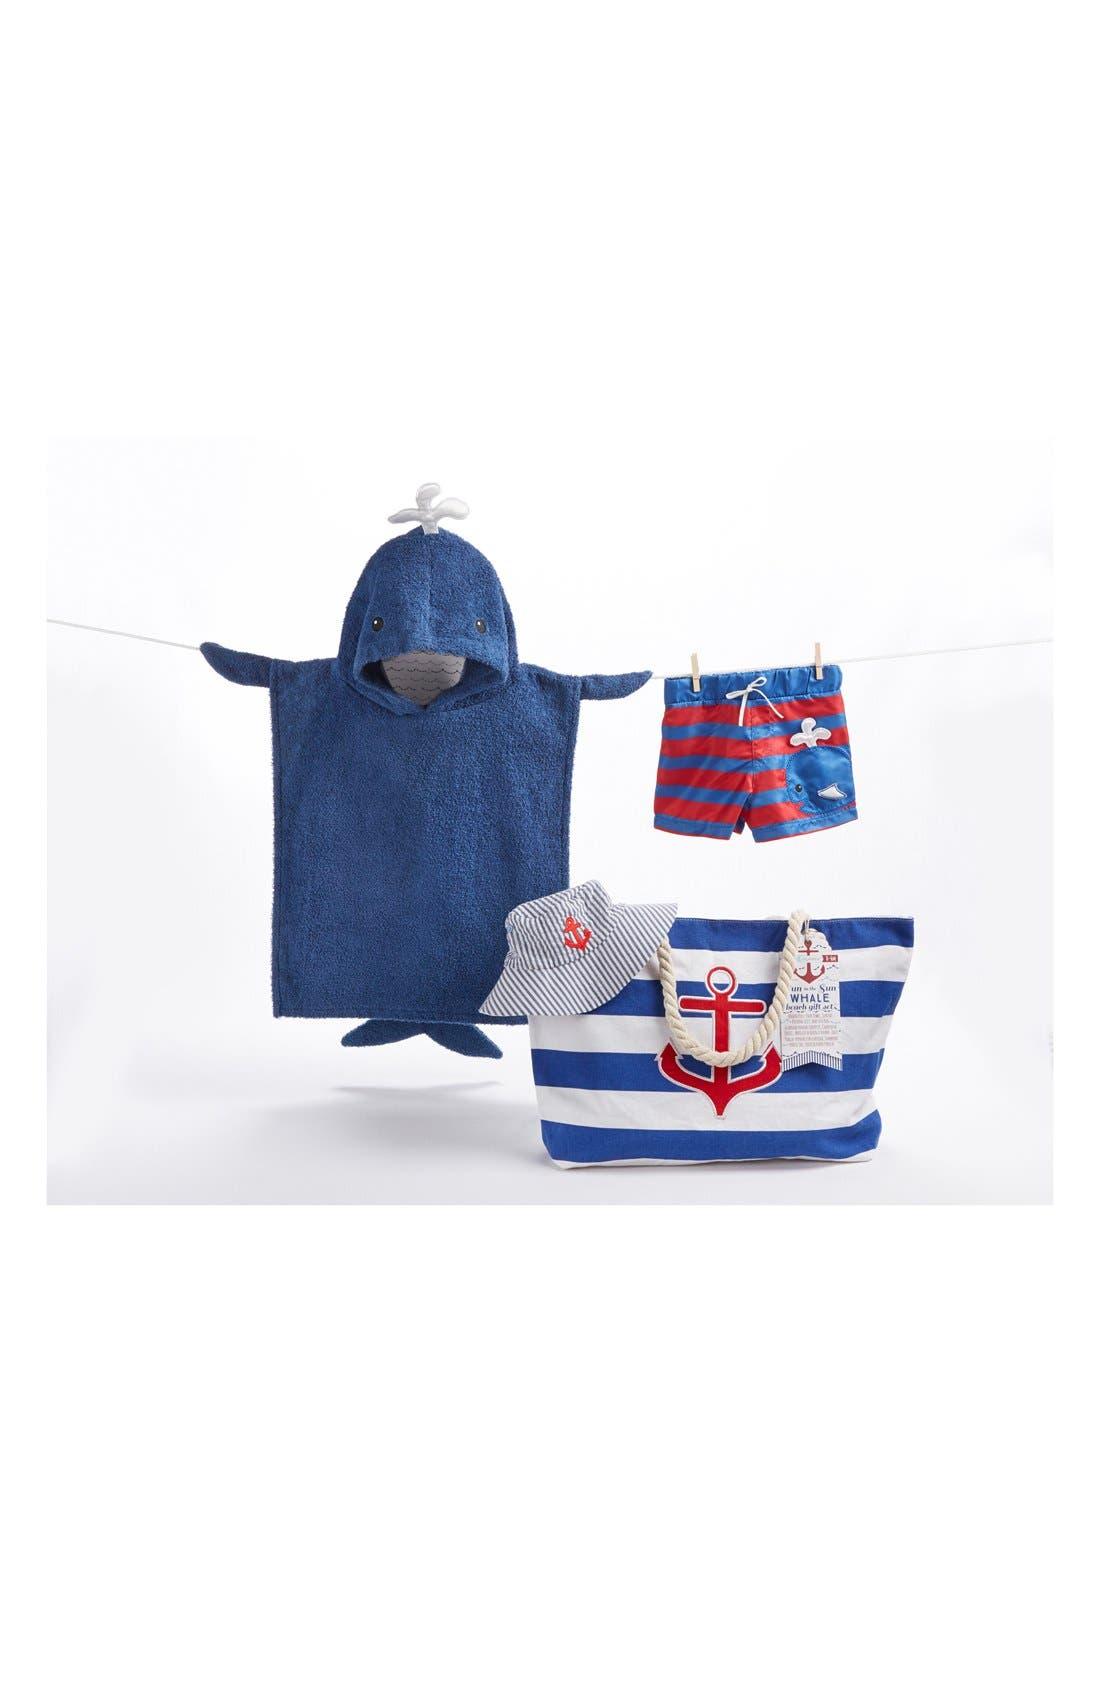 Alternate Image 1 Selected - Baby Aspen Nautical 4-Piece Gift Set (Baby)